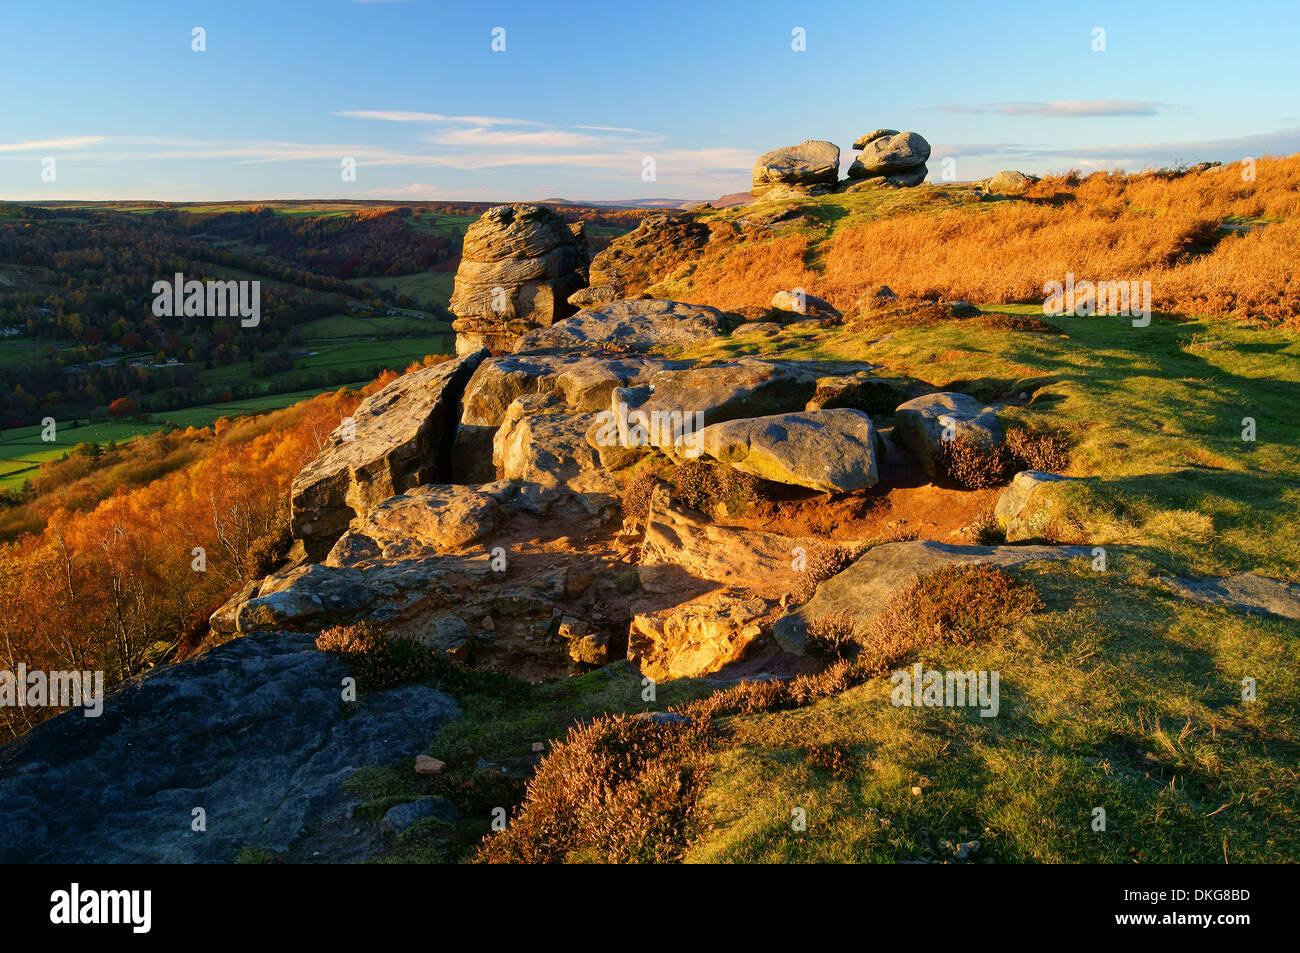 UK,Derbyshire,Peak District,Froggatt Edge - Stock Image